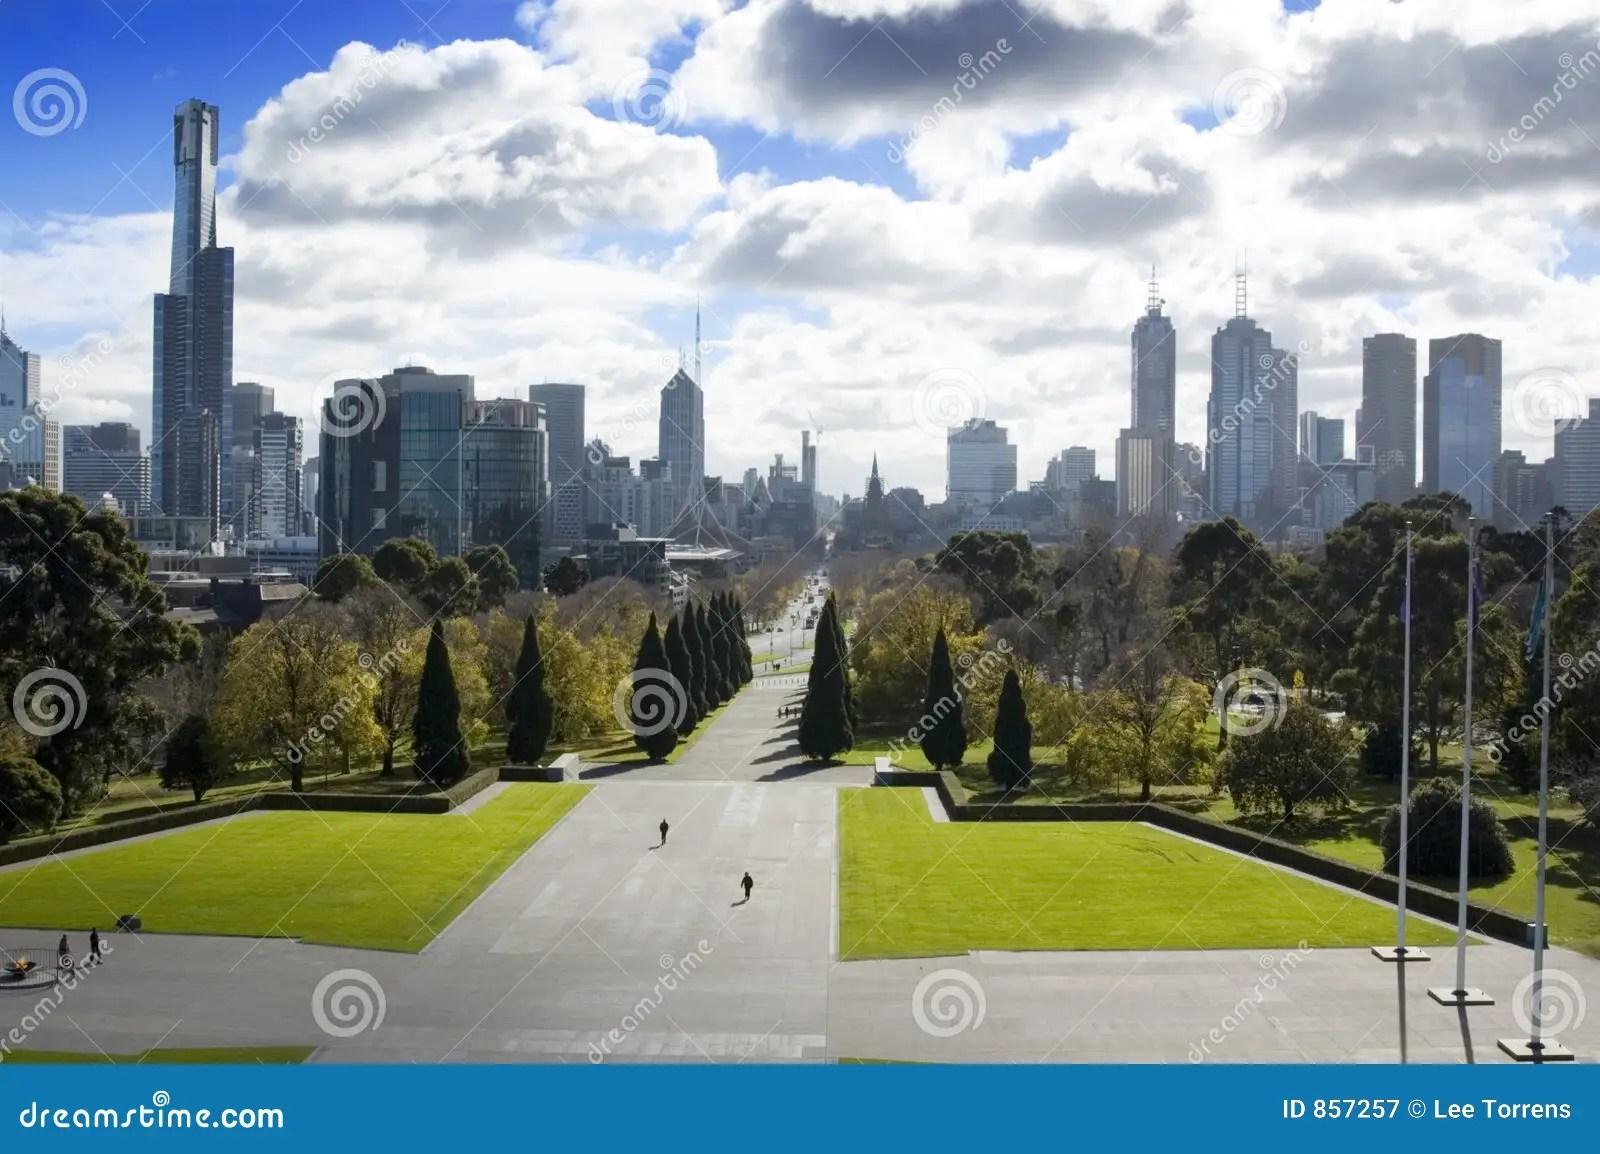 3d Wallpaper Australia Melbourne City Park Royalty Free Stock Photography Image